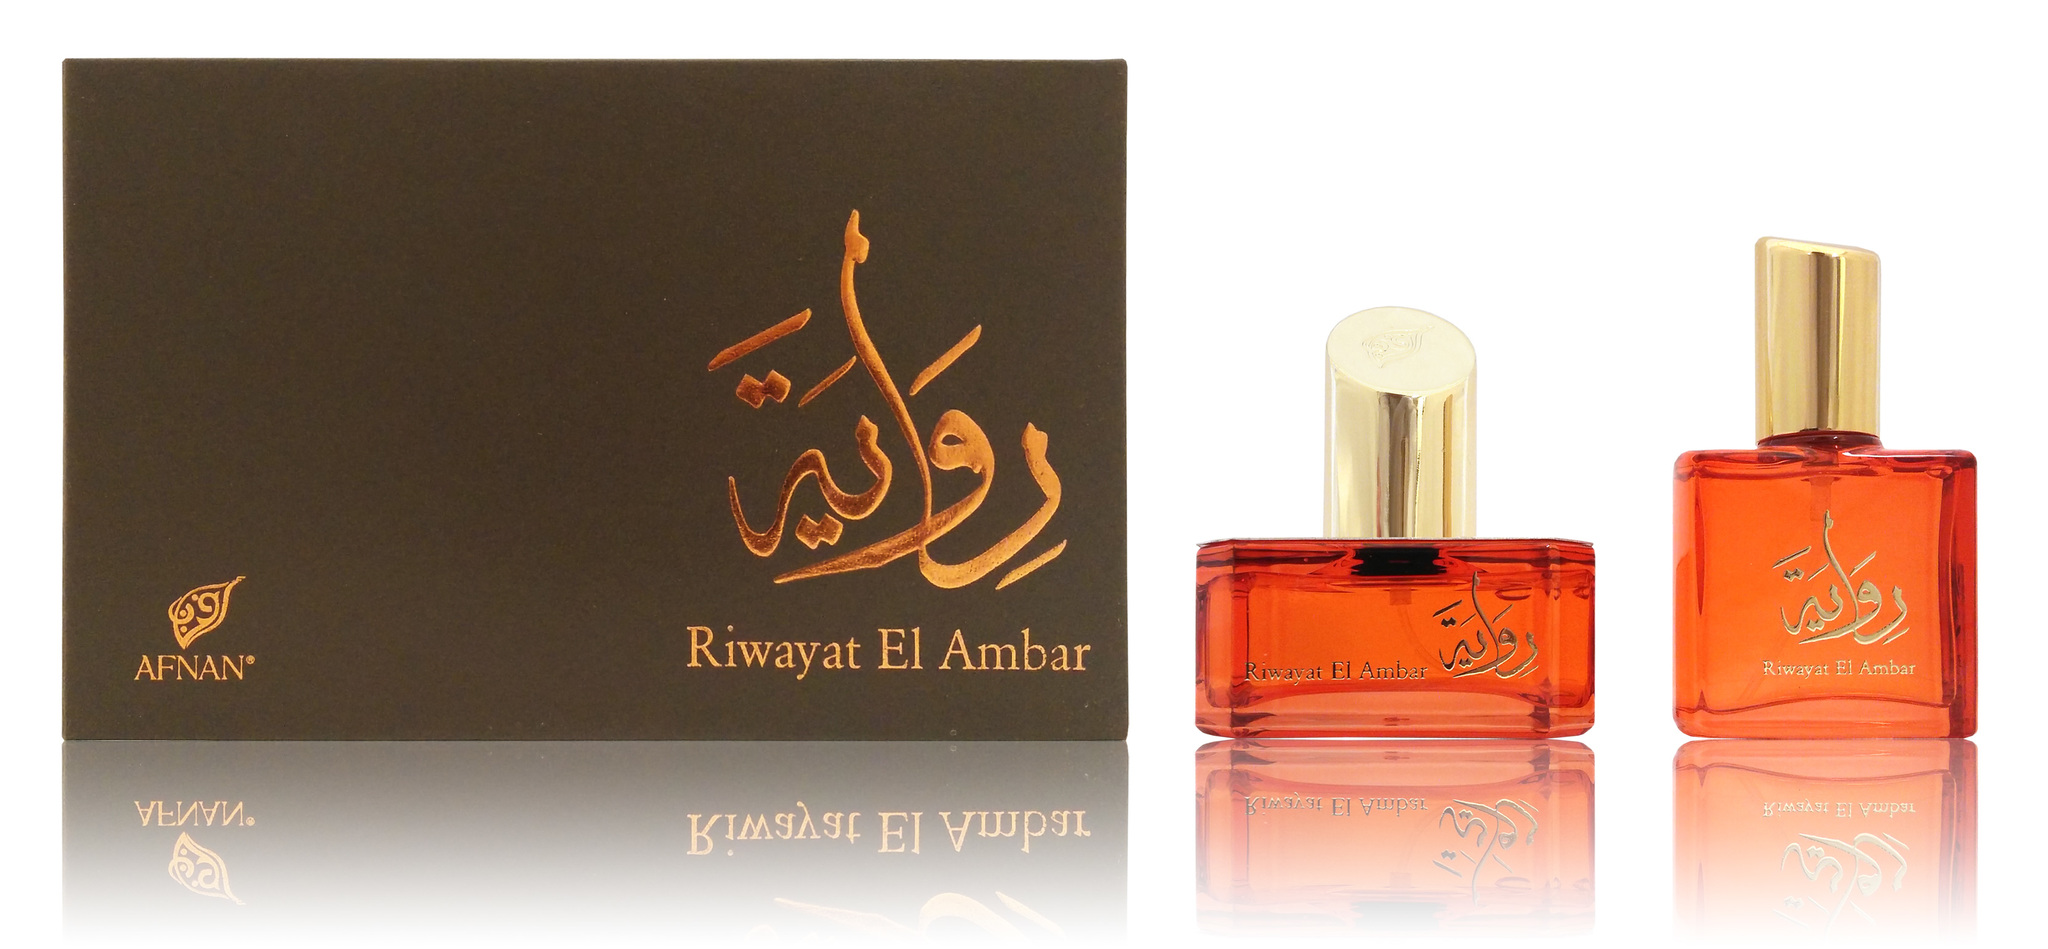 Riwayat El Ambar u EDP 50+20 ML спрей от Афнан Парфюм Afnan Perfumes